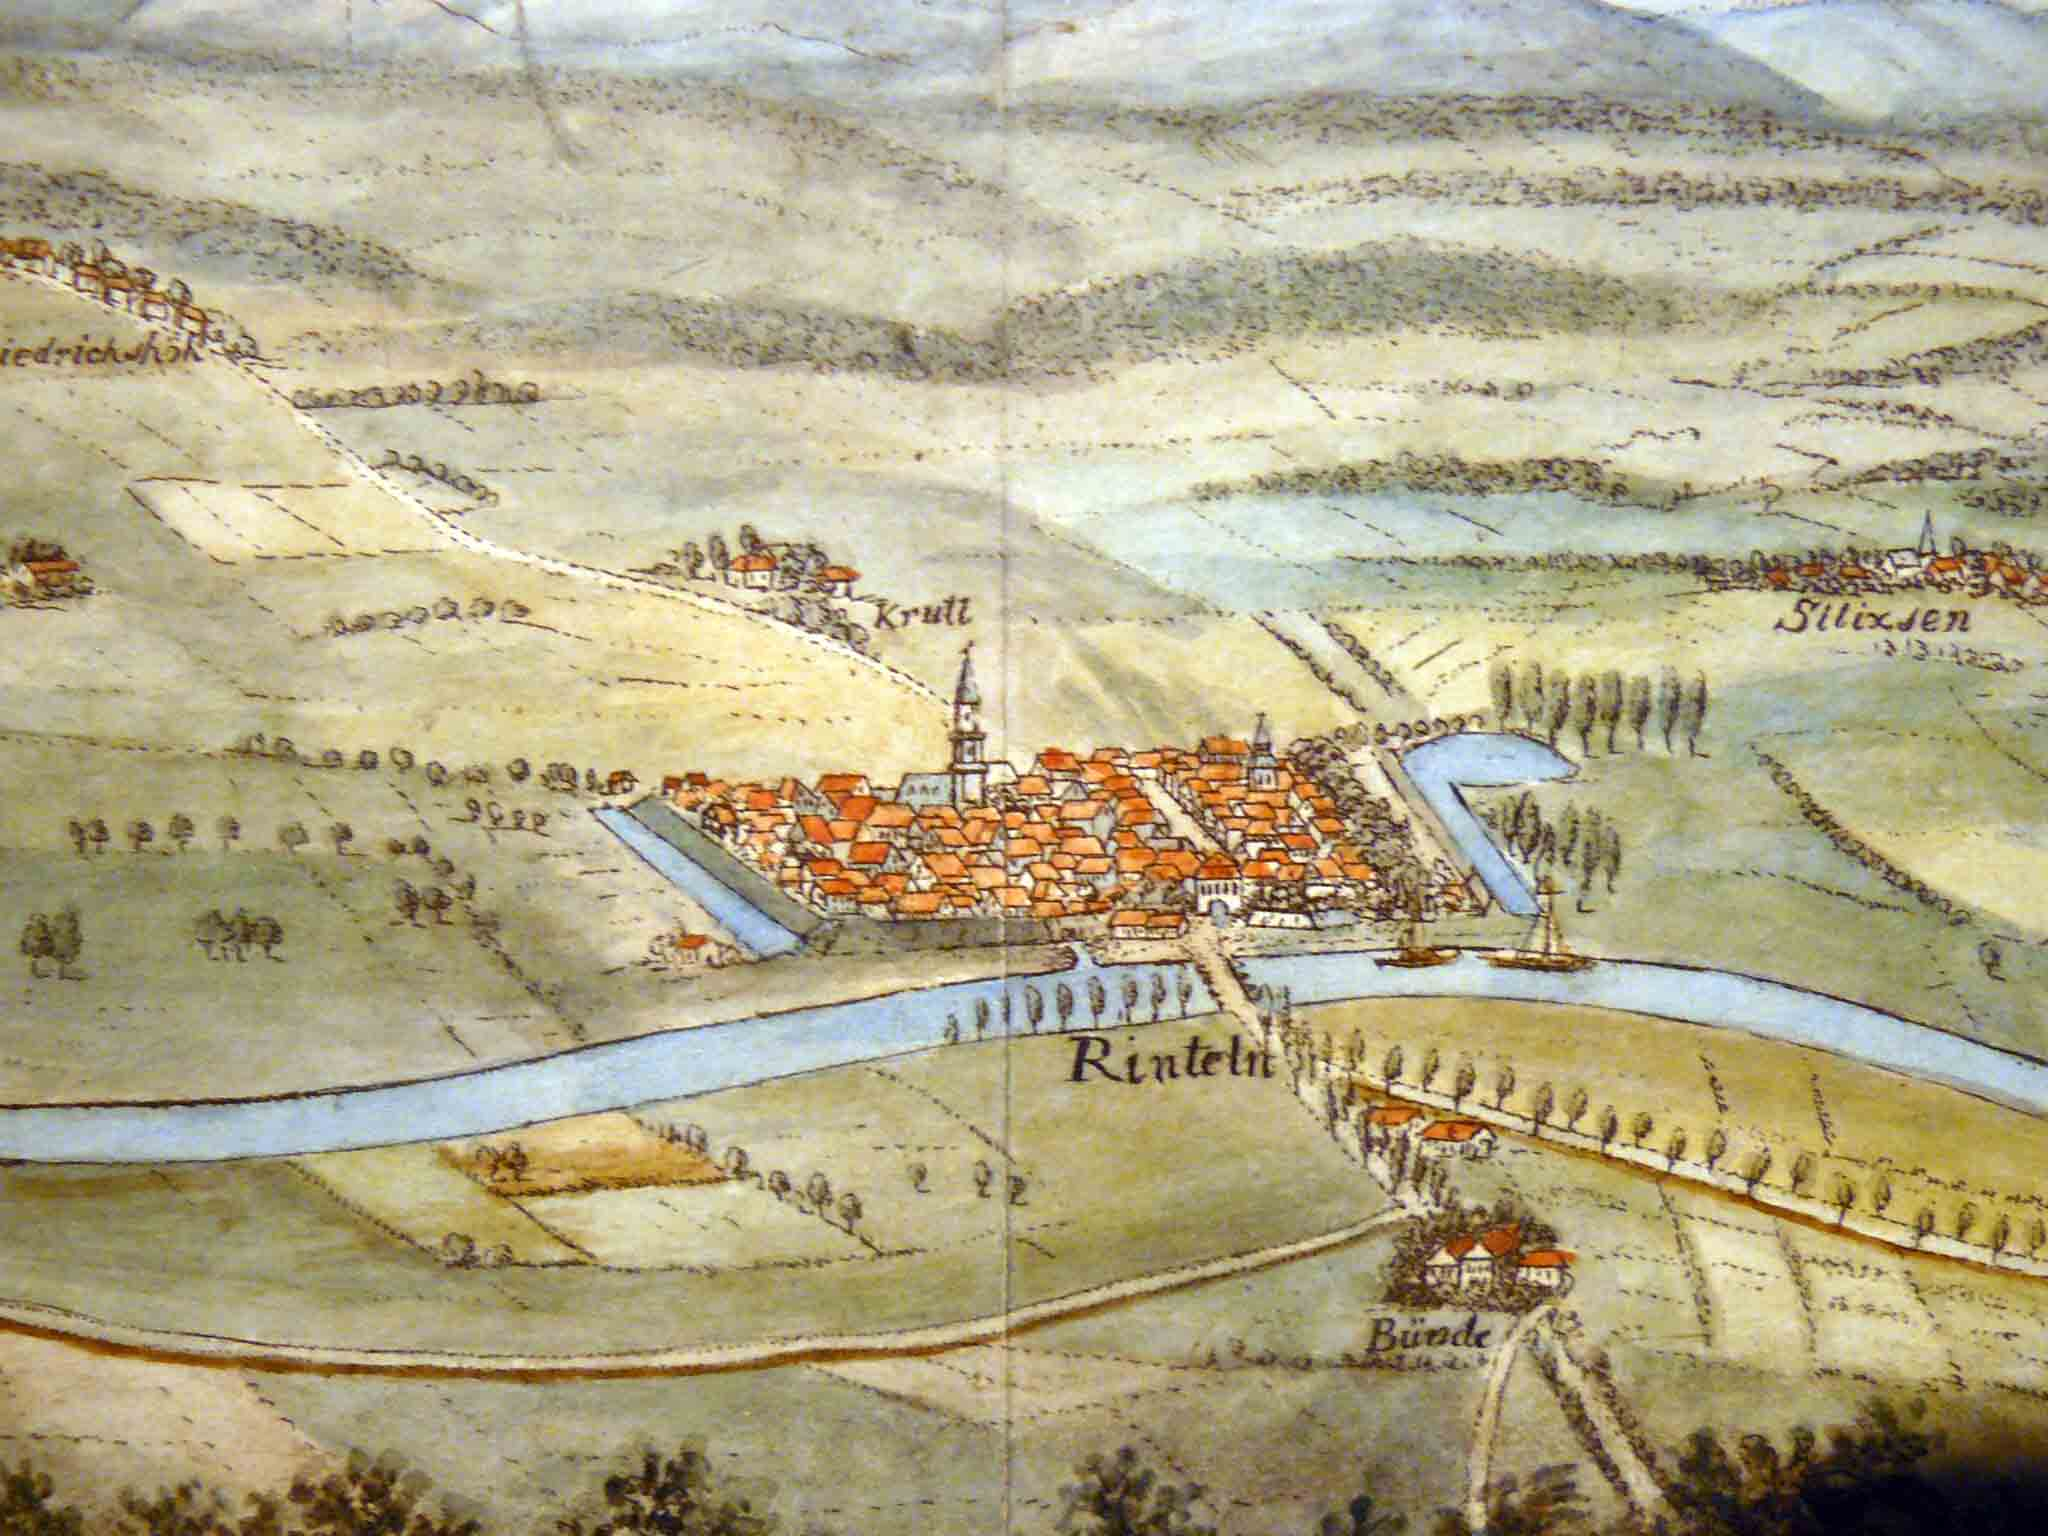 Rinteln 1828